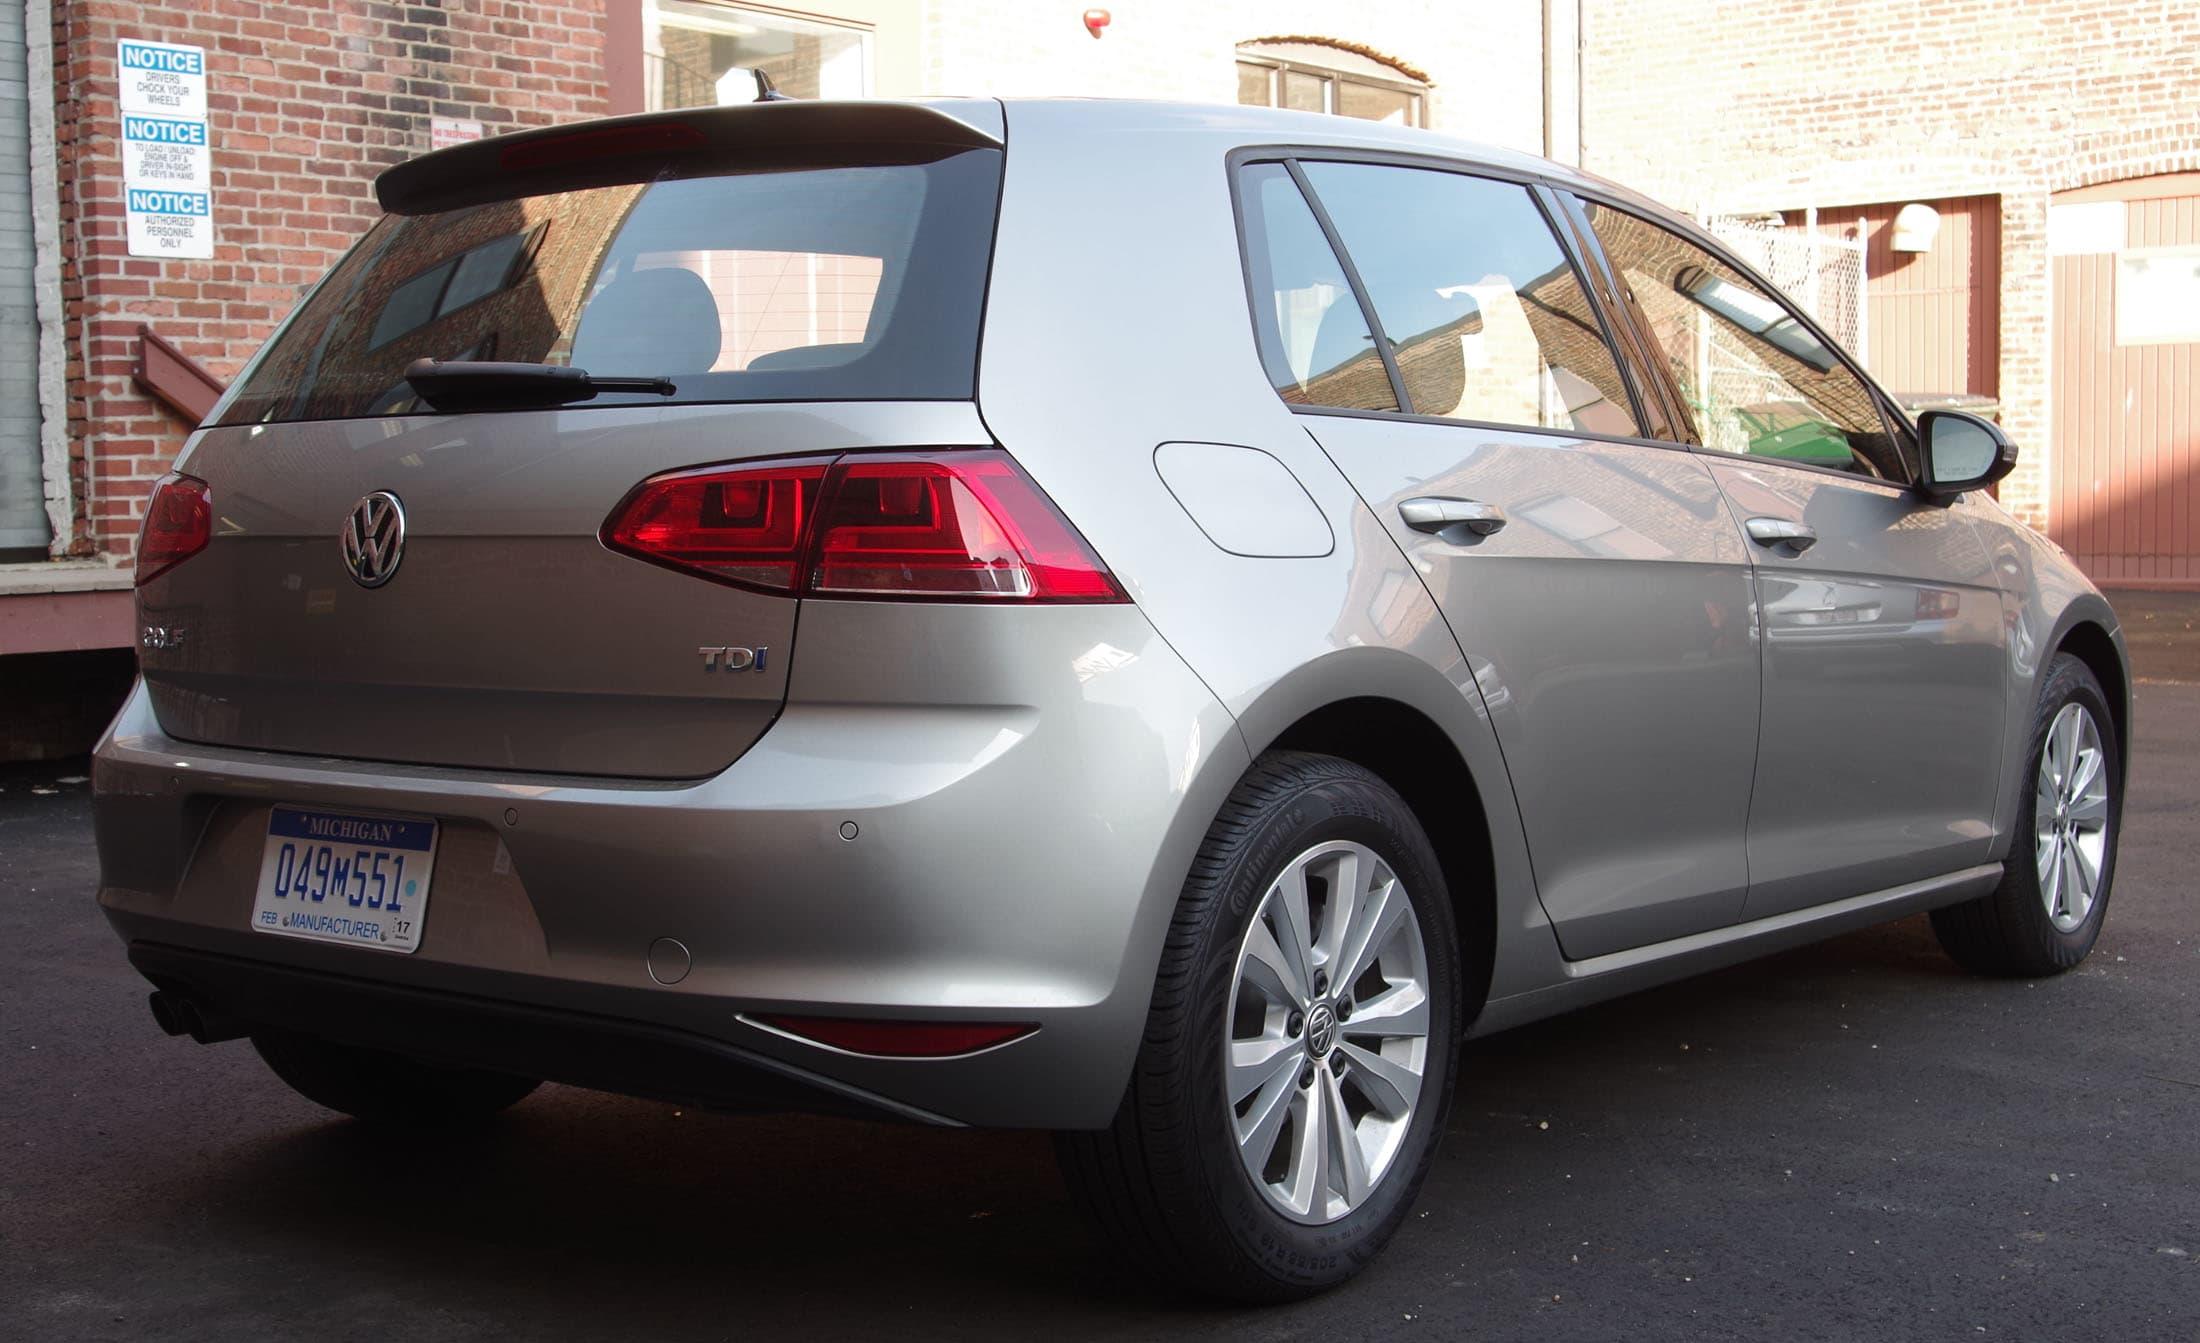 2015 VW Golf rear